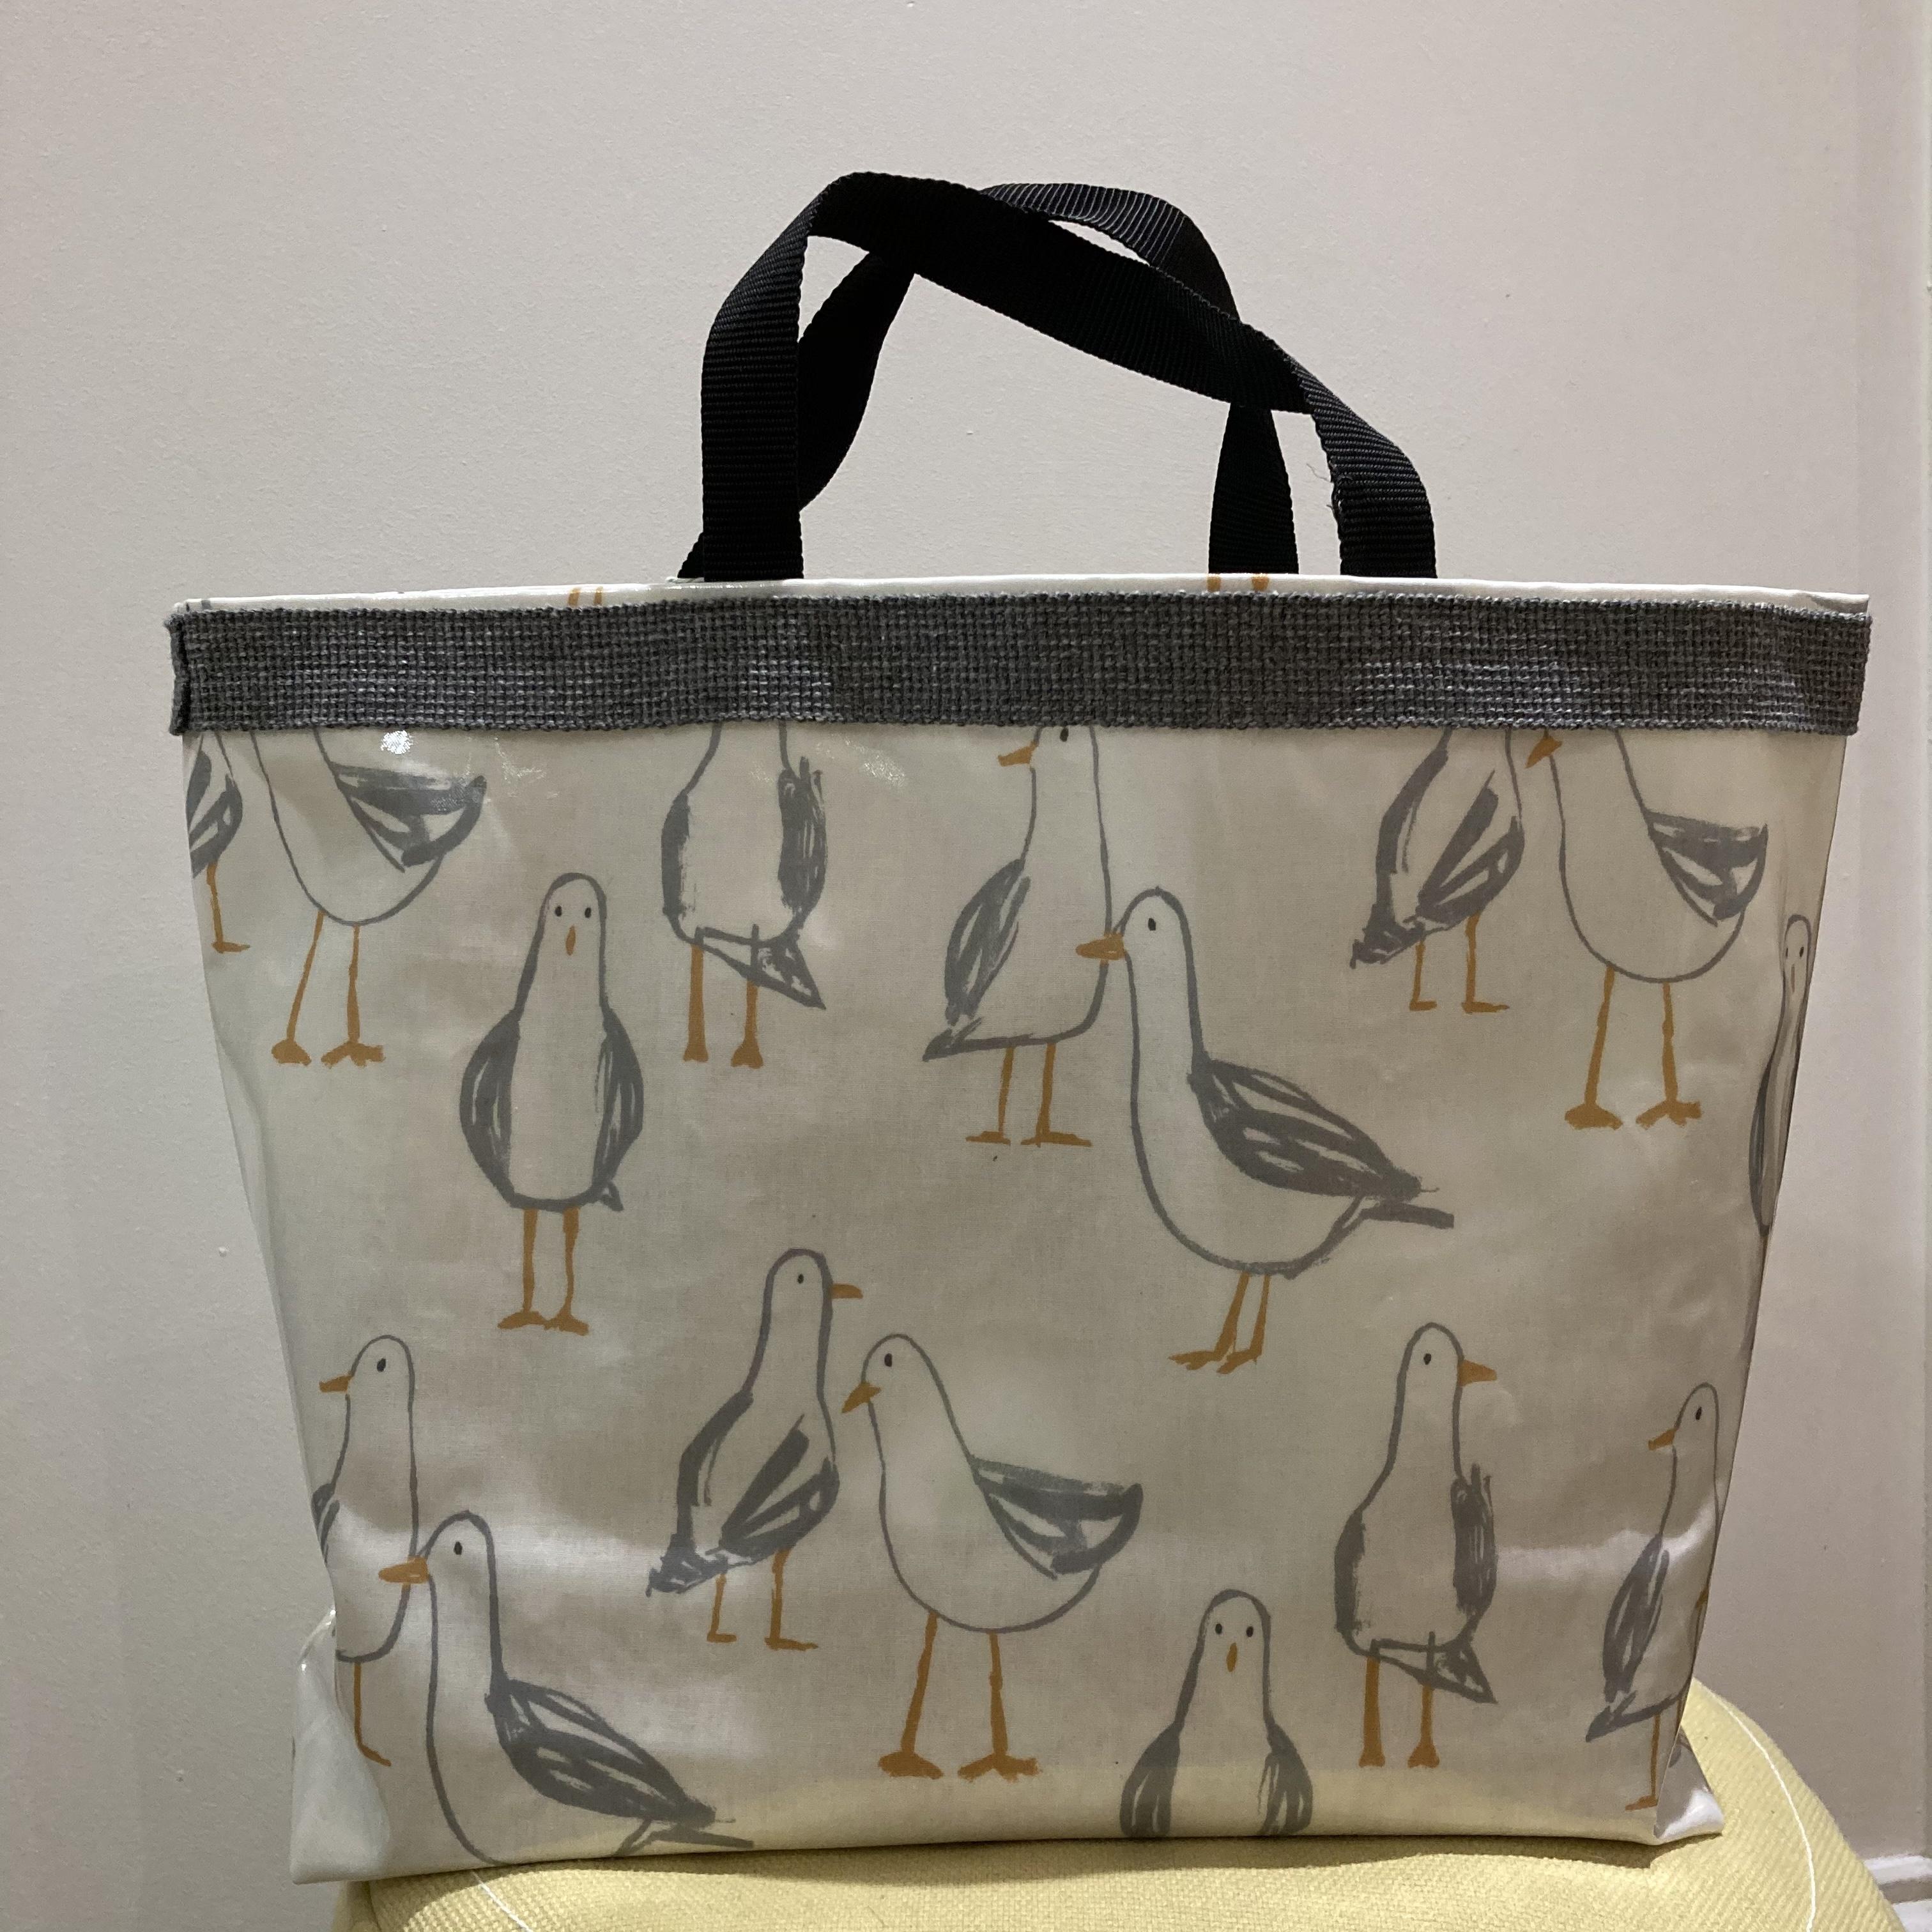 Seagull vinyl tote bag by Stella's stitchcraft